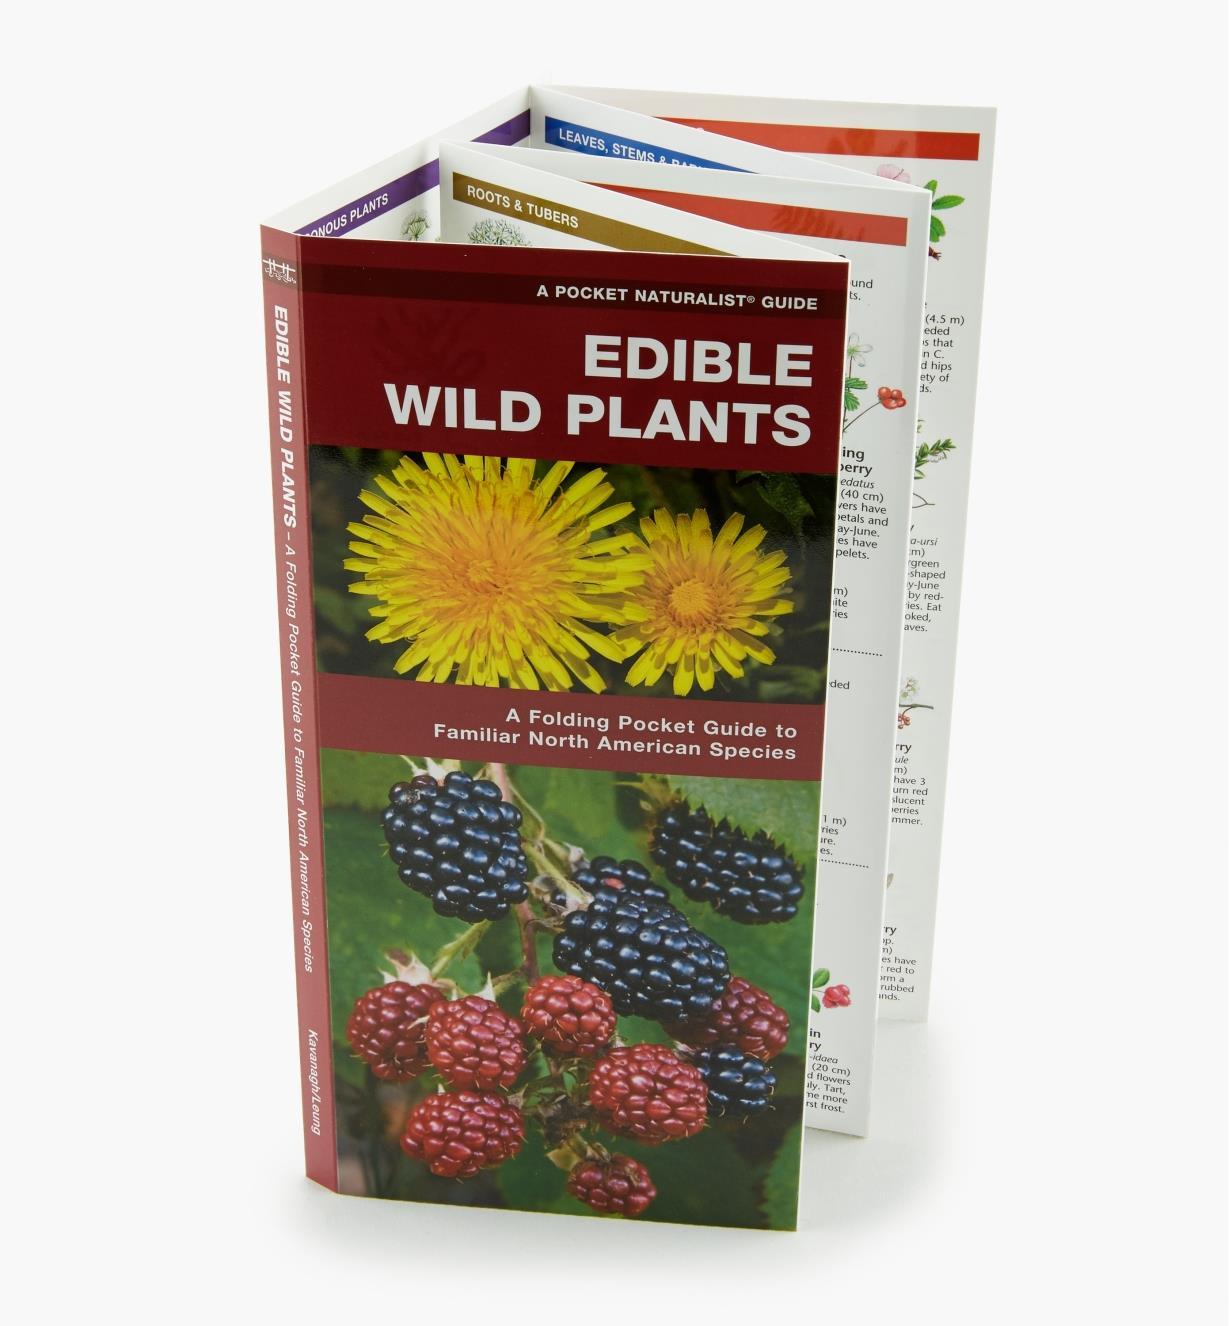 LA257 - Edible Wild Plants Pocket Guide